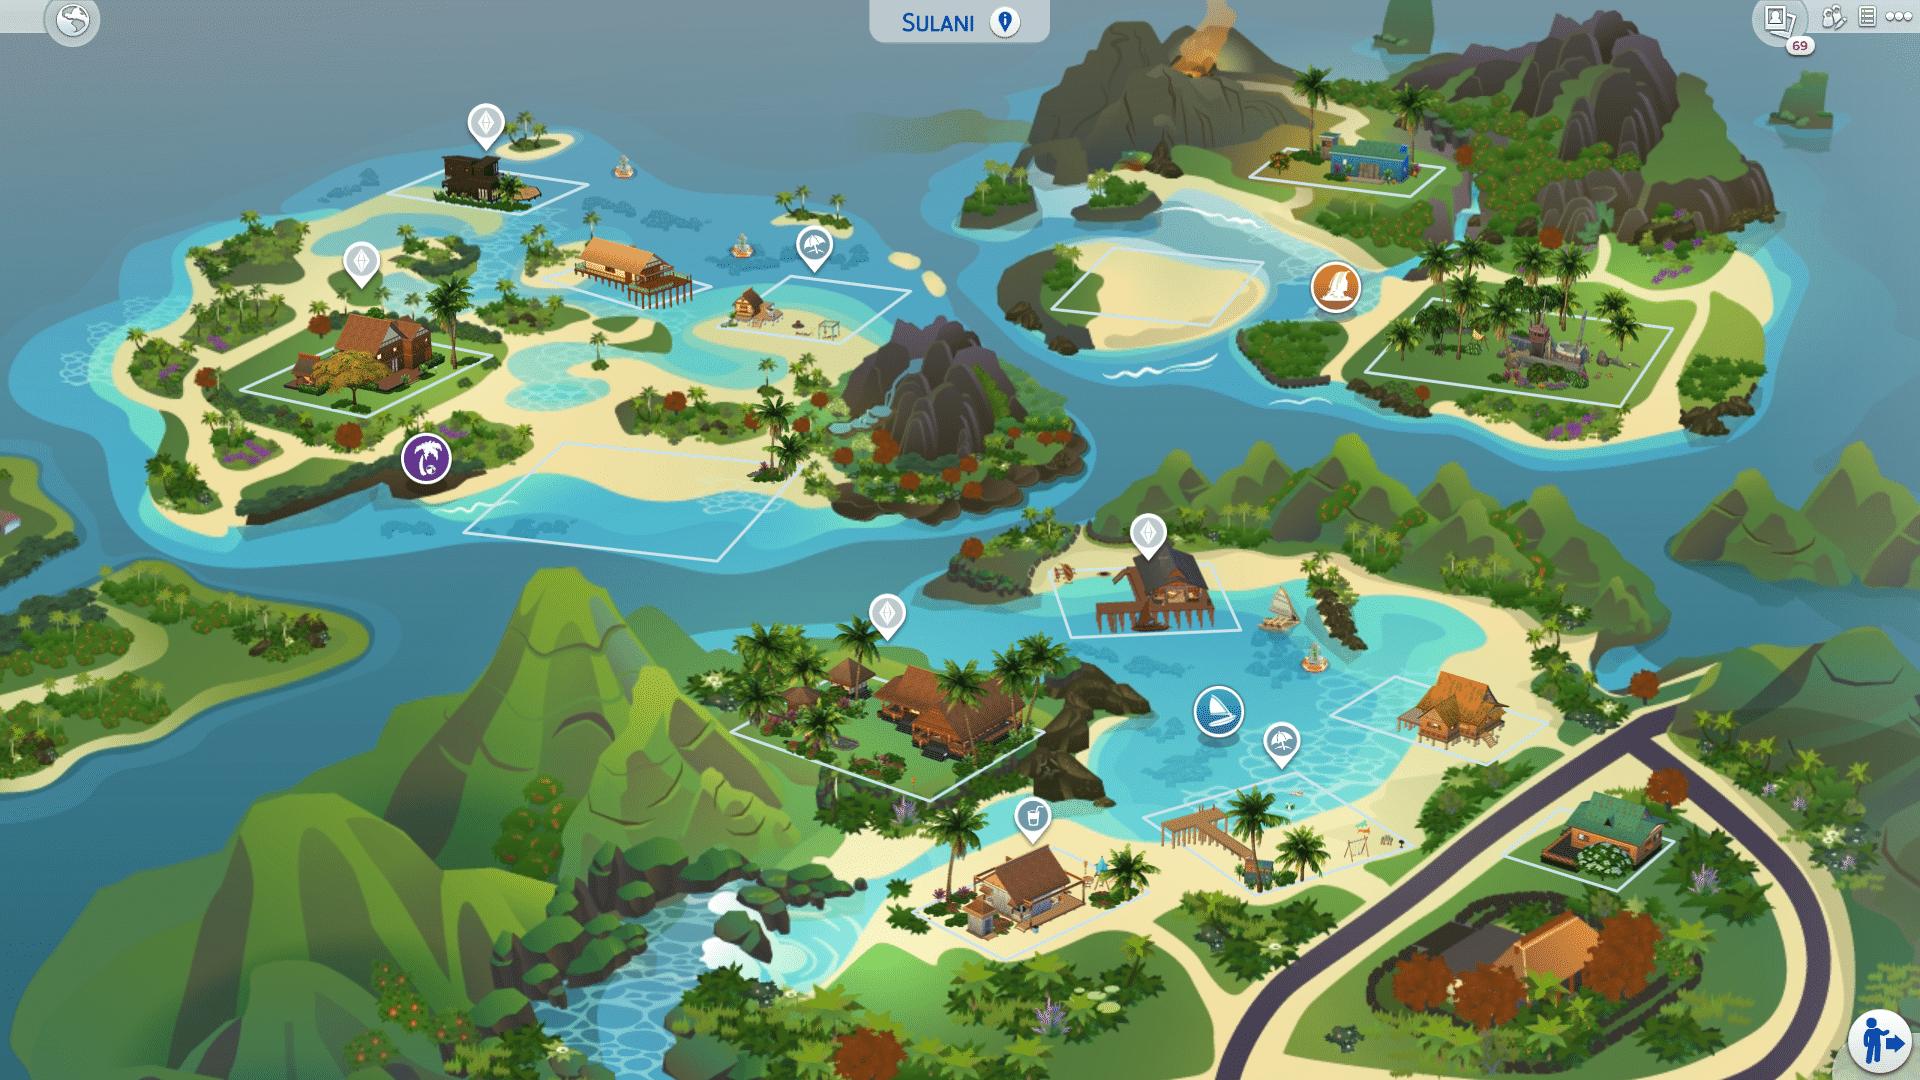 Xbox One Les Sims 4: Iles paradisiaques